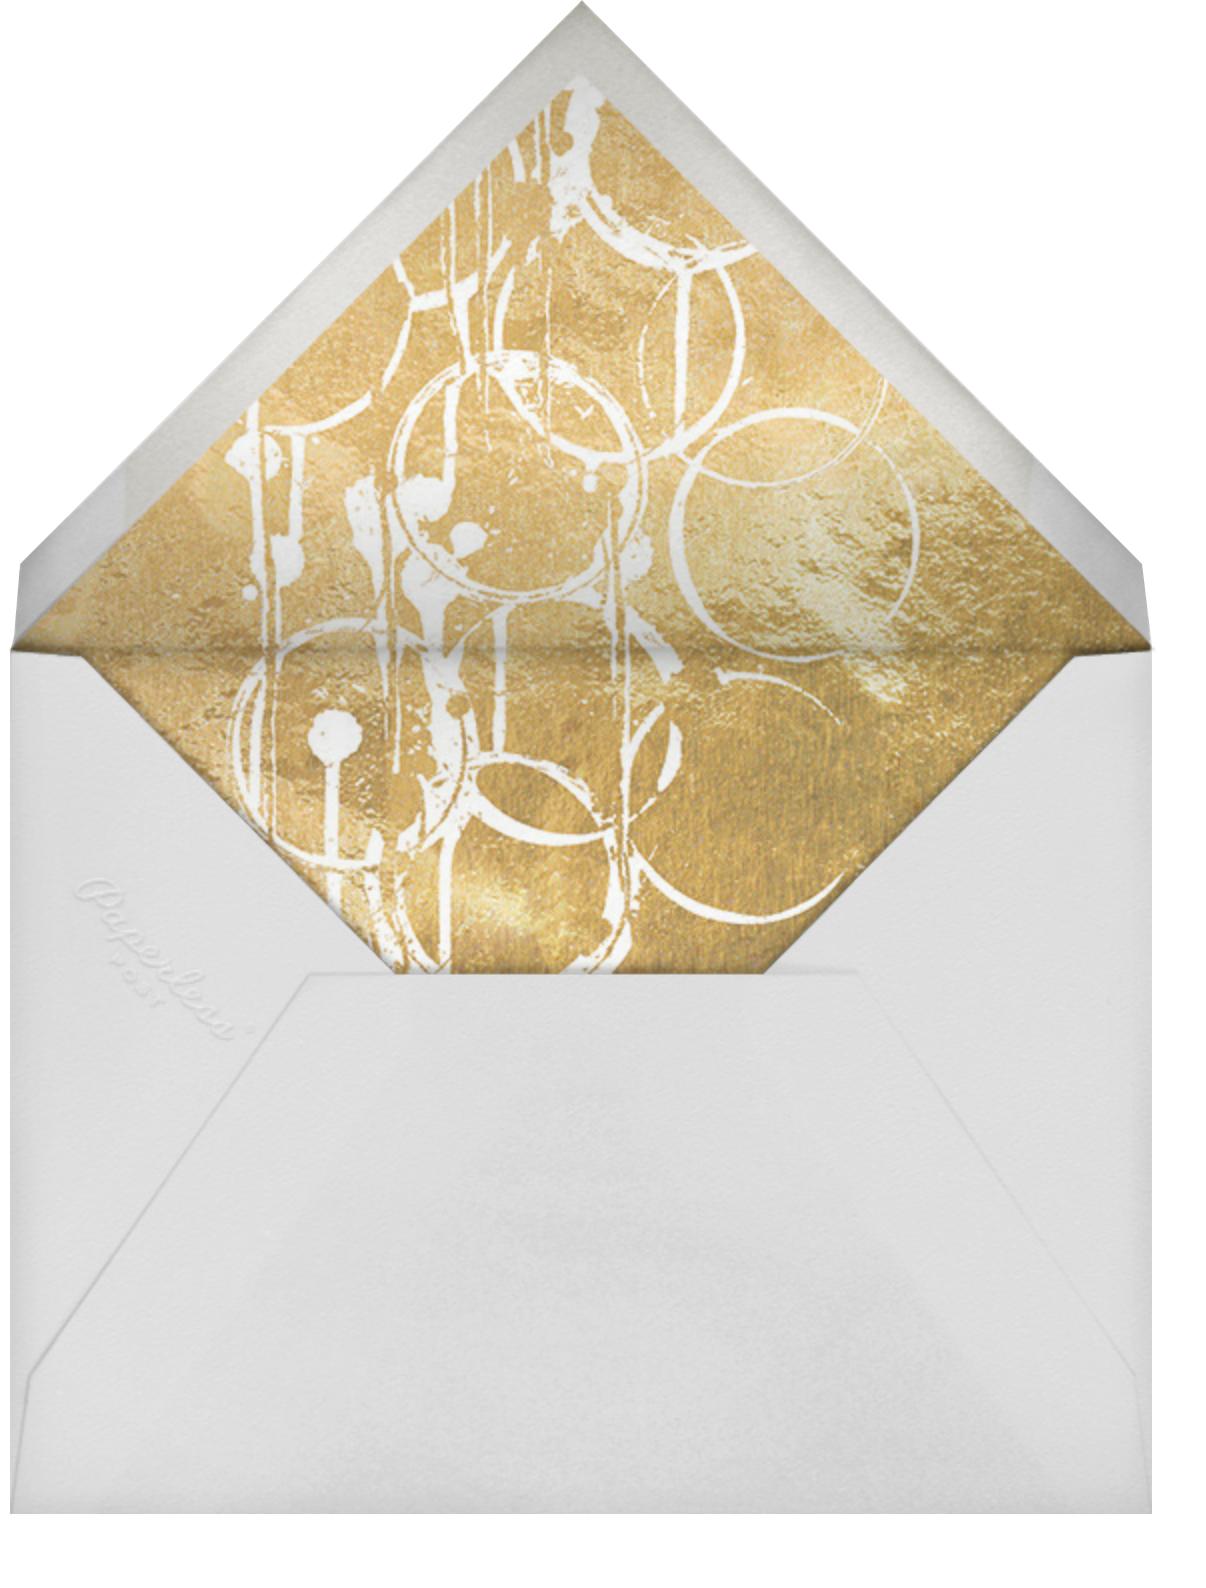 Bottle Shock - Gold - Kelly Wearstler - Bridal shower - envelope back